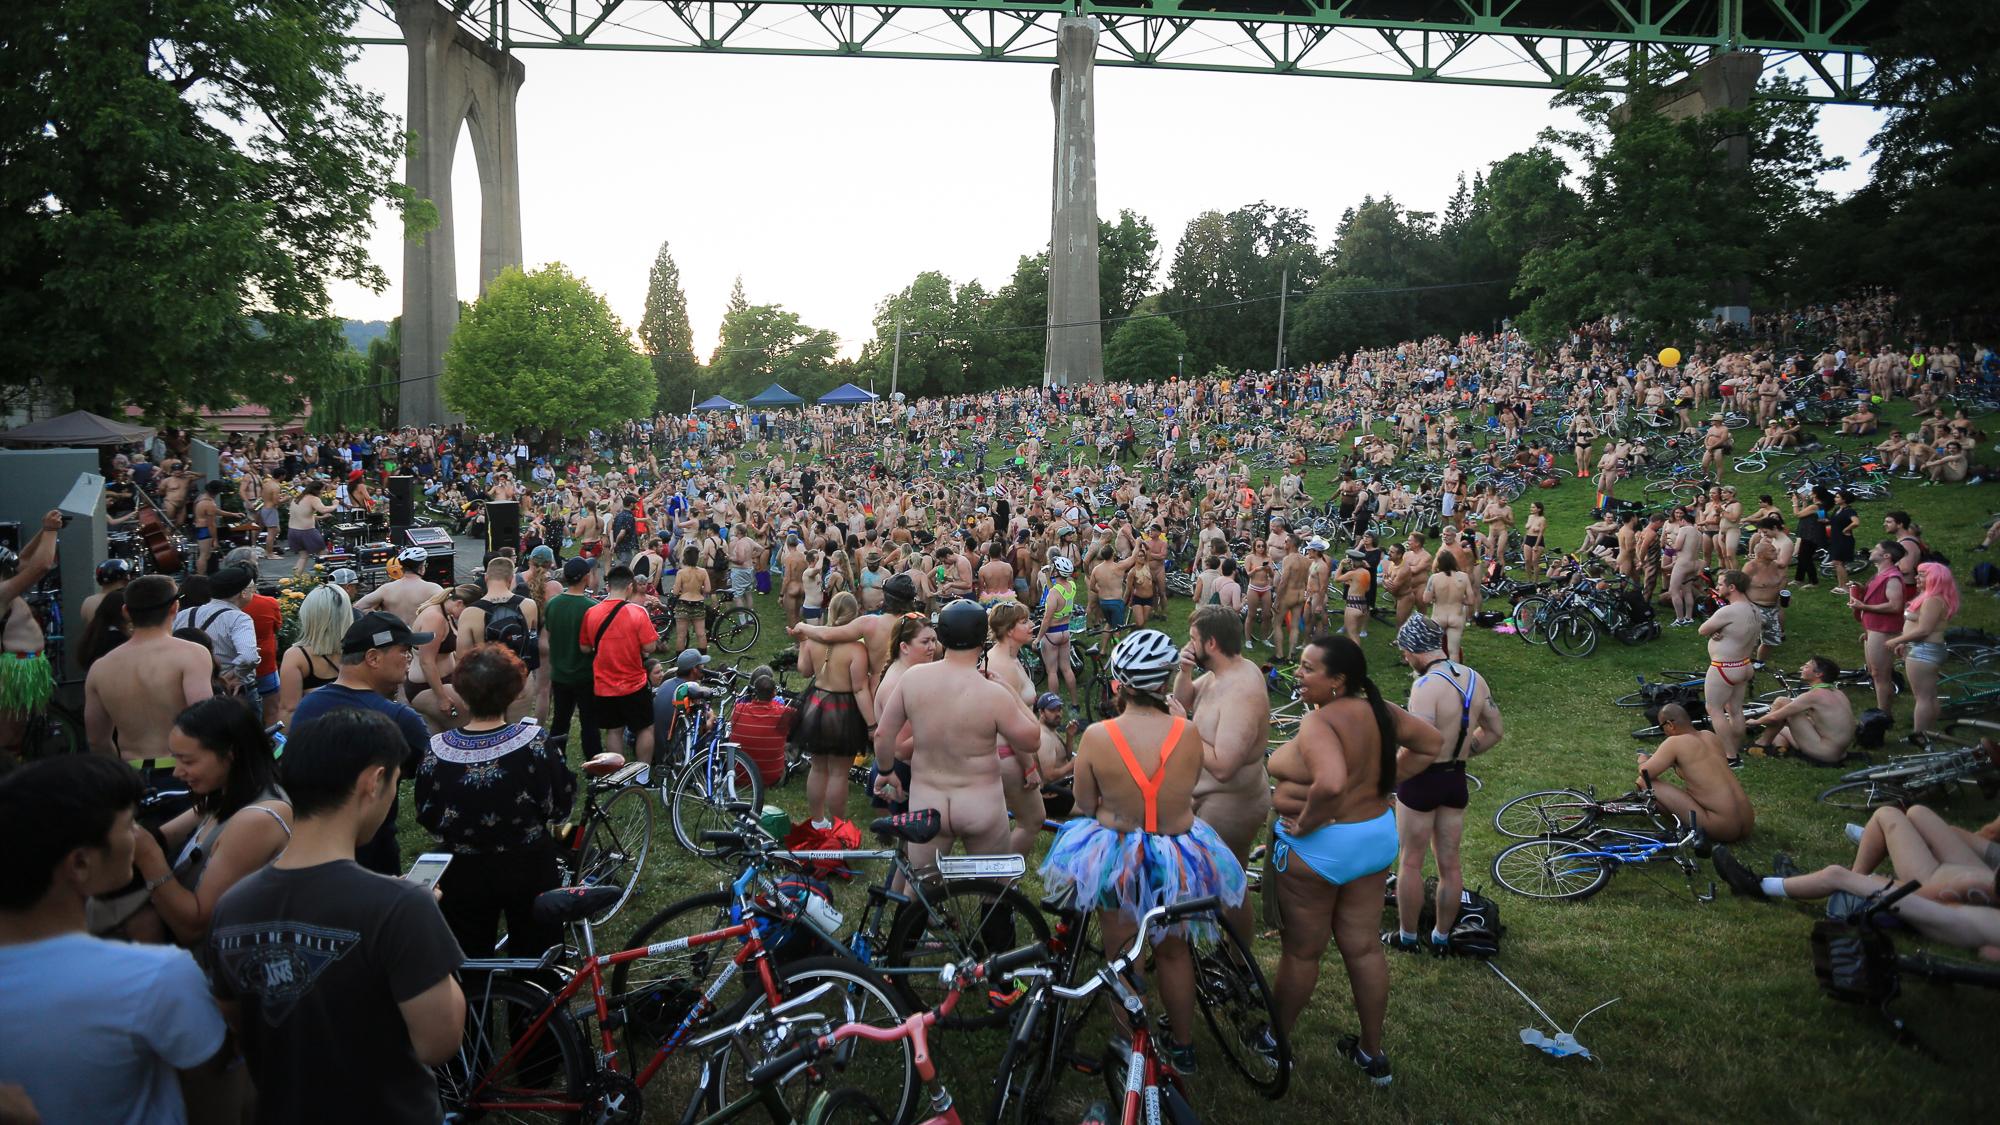 Naked Bike Ride Pics